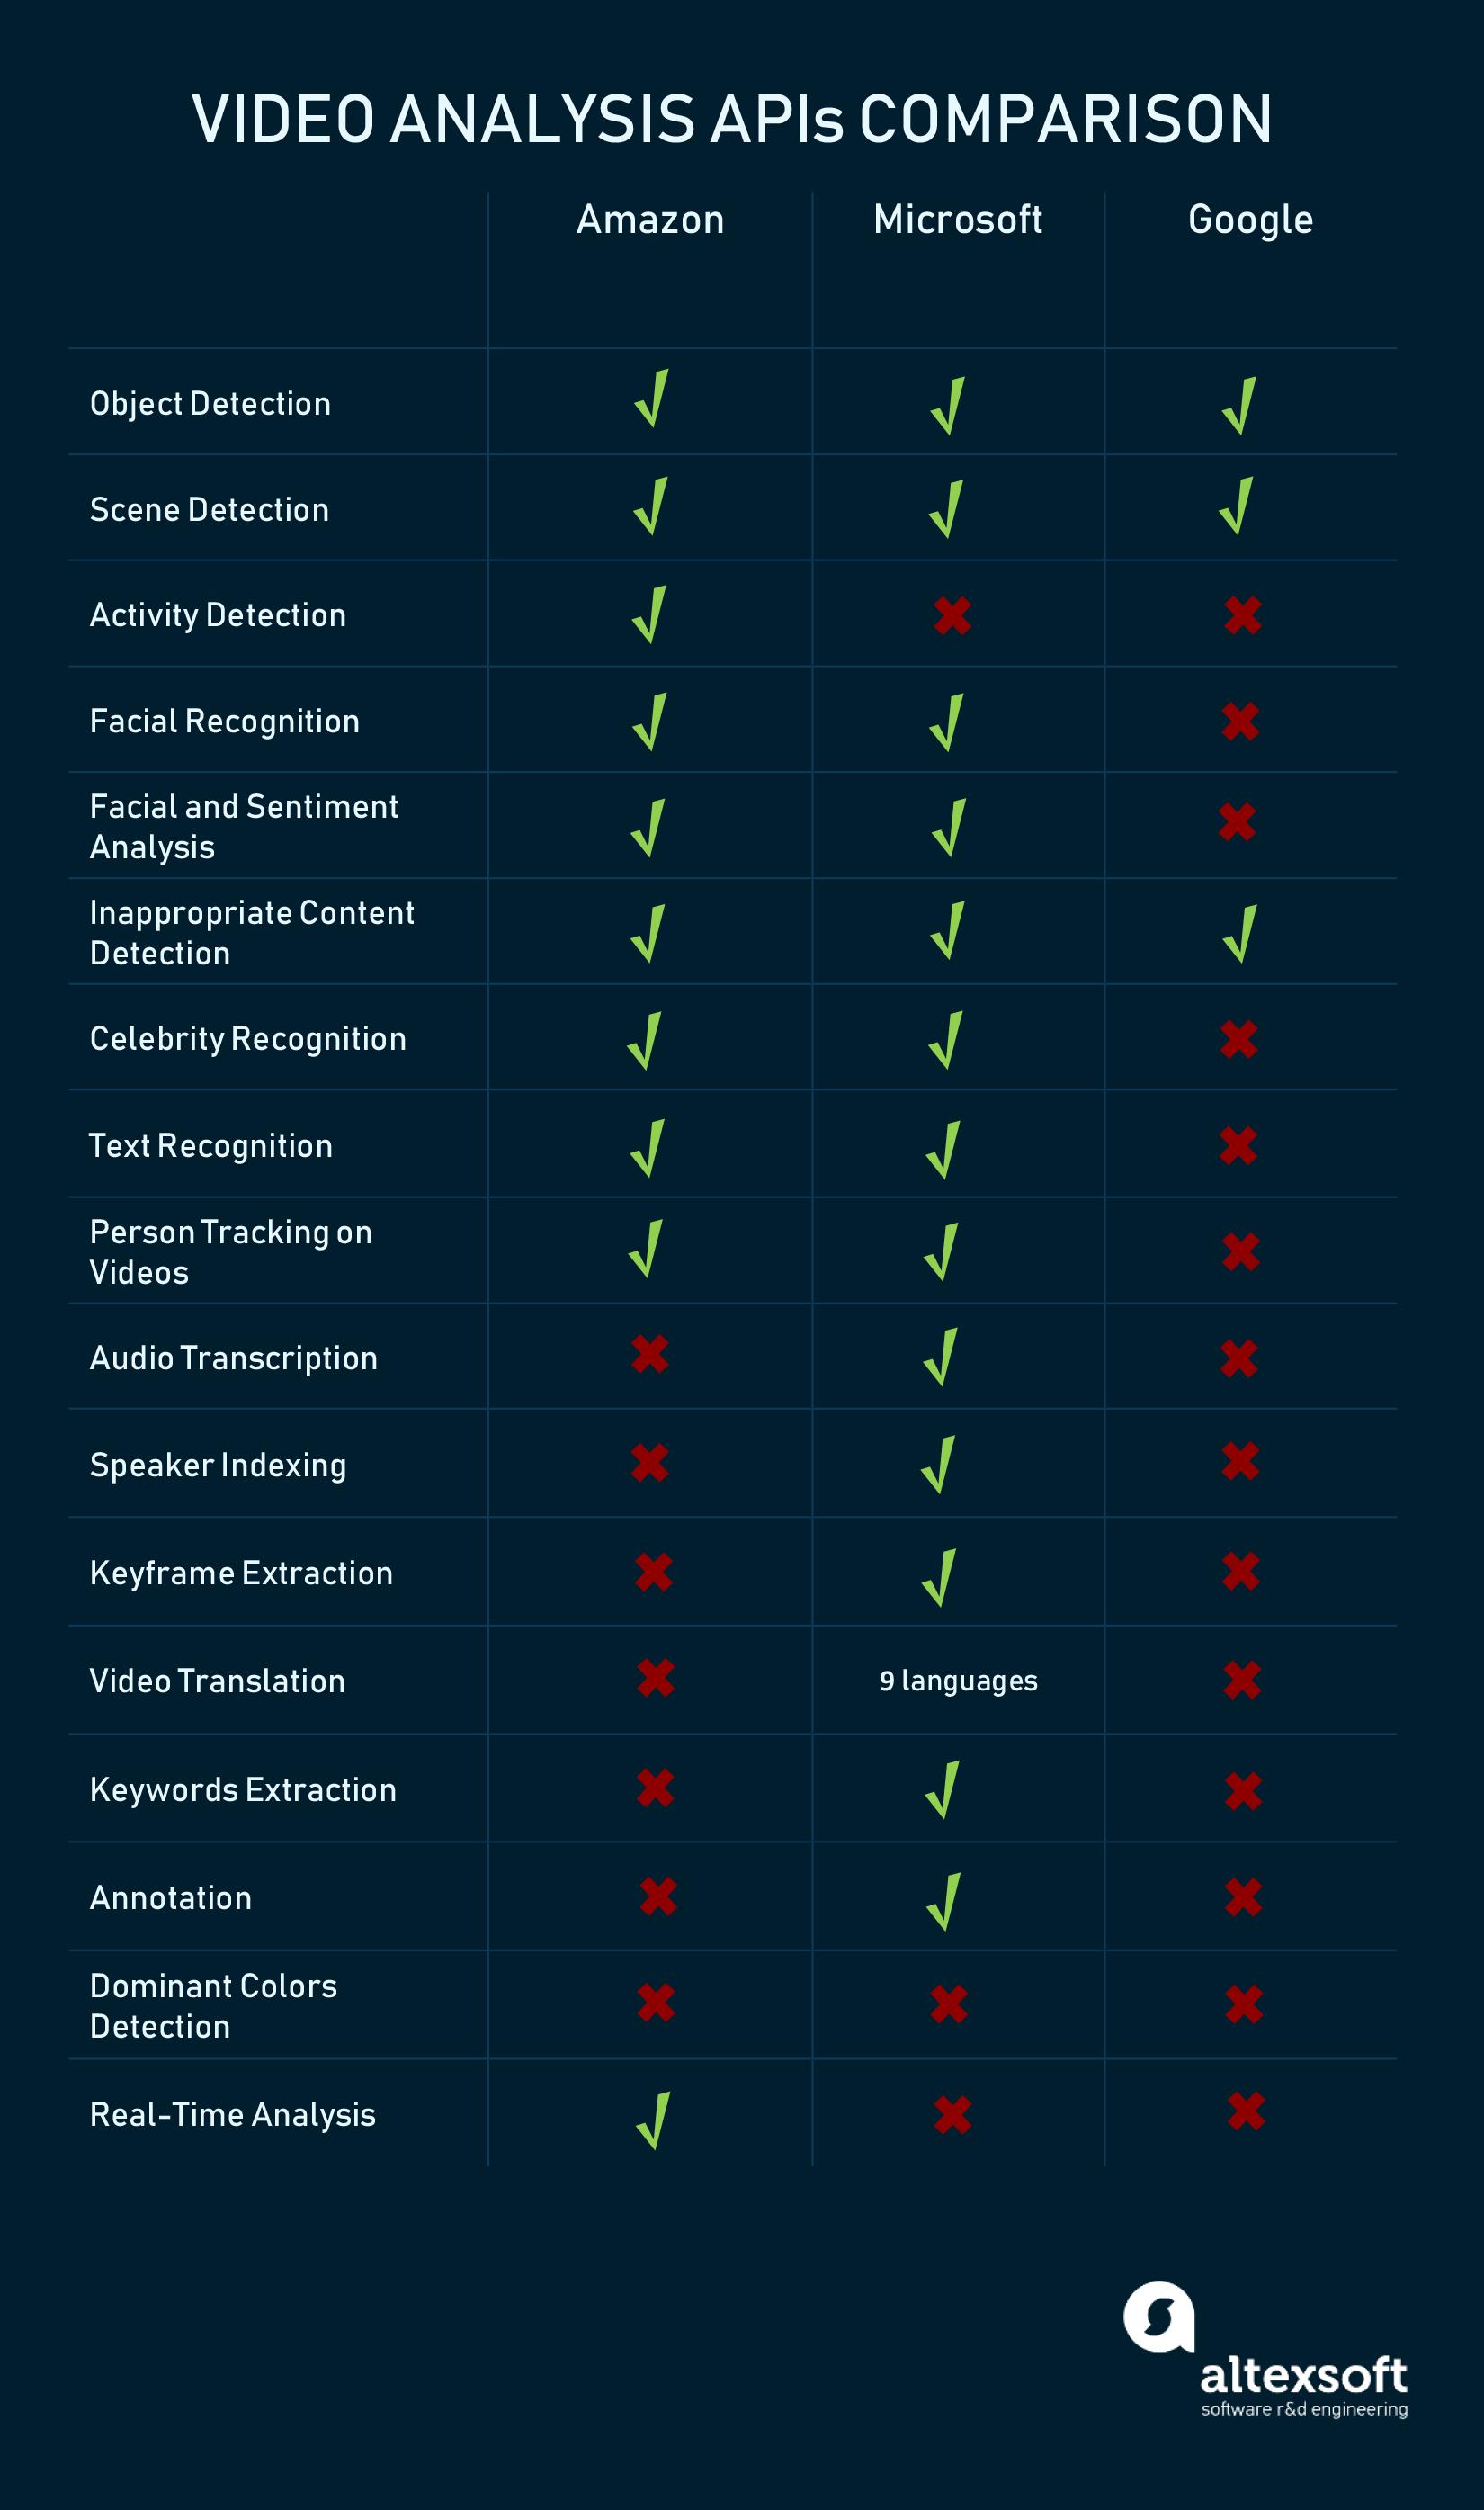 Video analysis APIs comparison